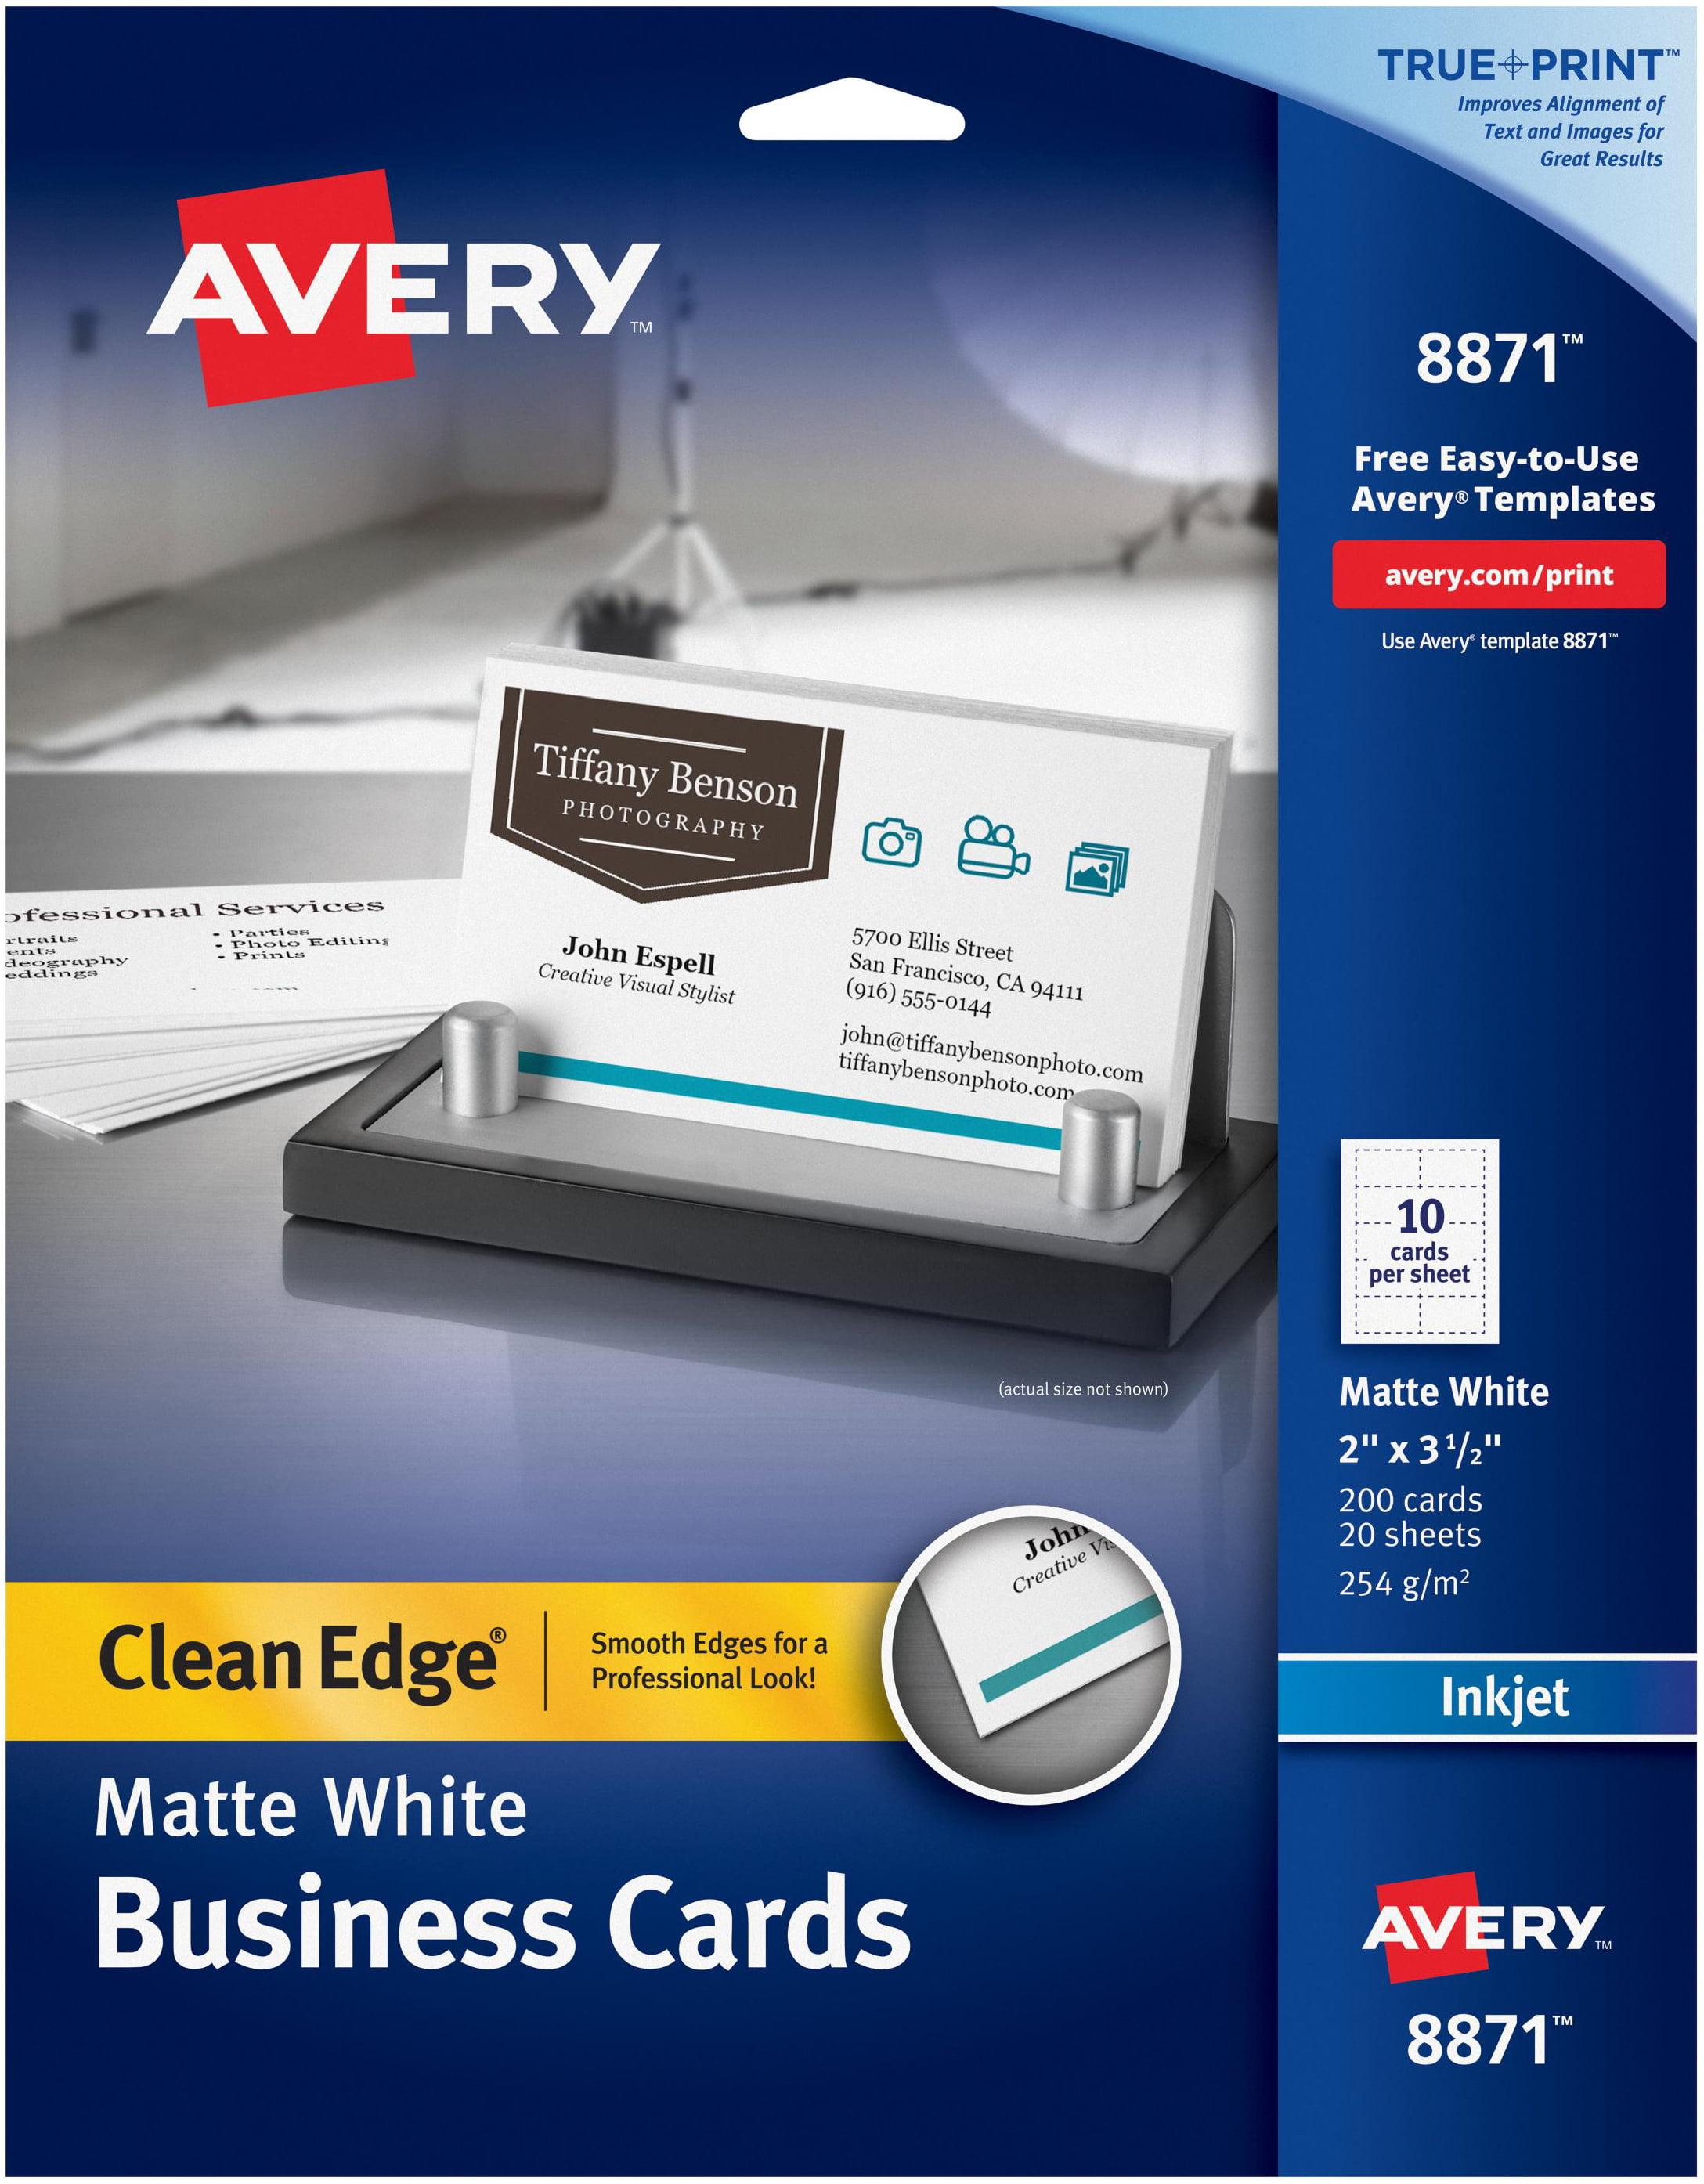 Avery matte white clean edge business cards 2x35 200pkg for avery matte white clean edge business cards 2x35 200pkg for inkjet printers two side printable 8871 colourmoves